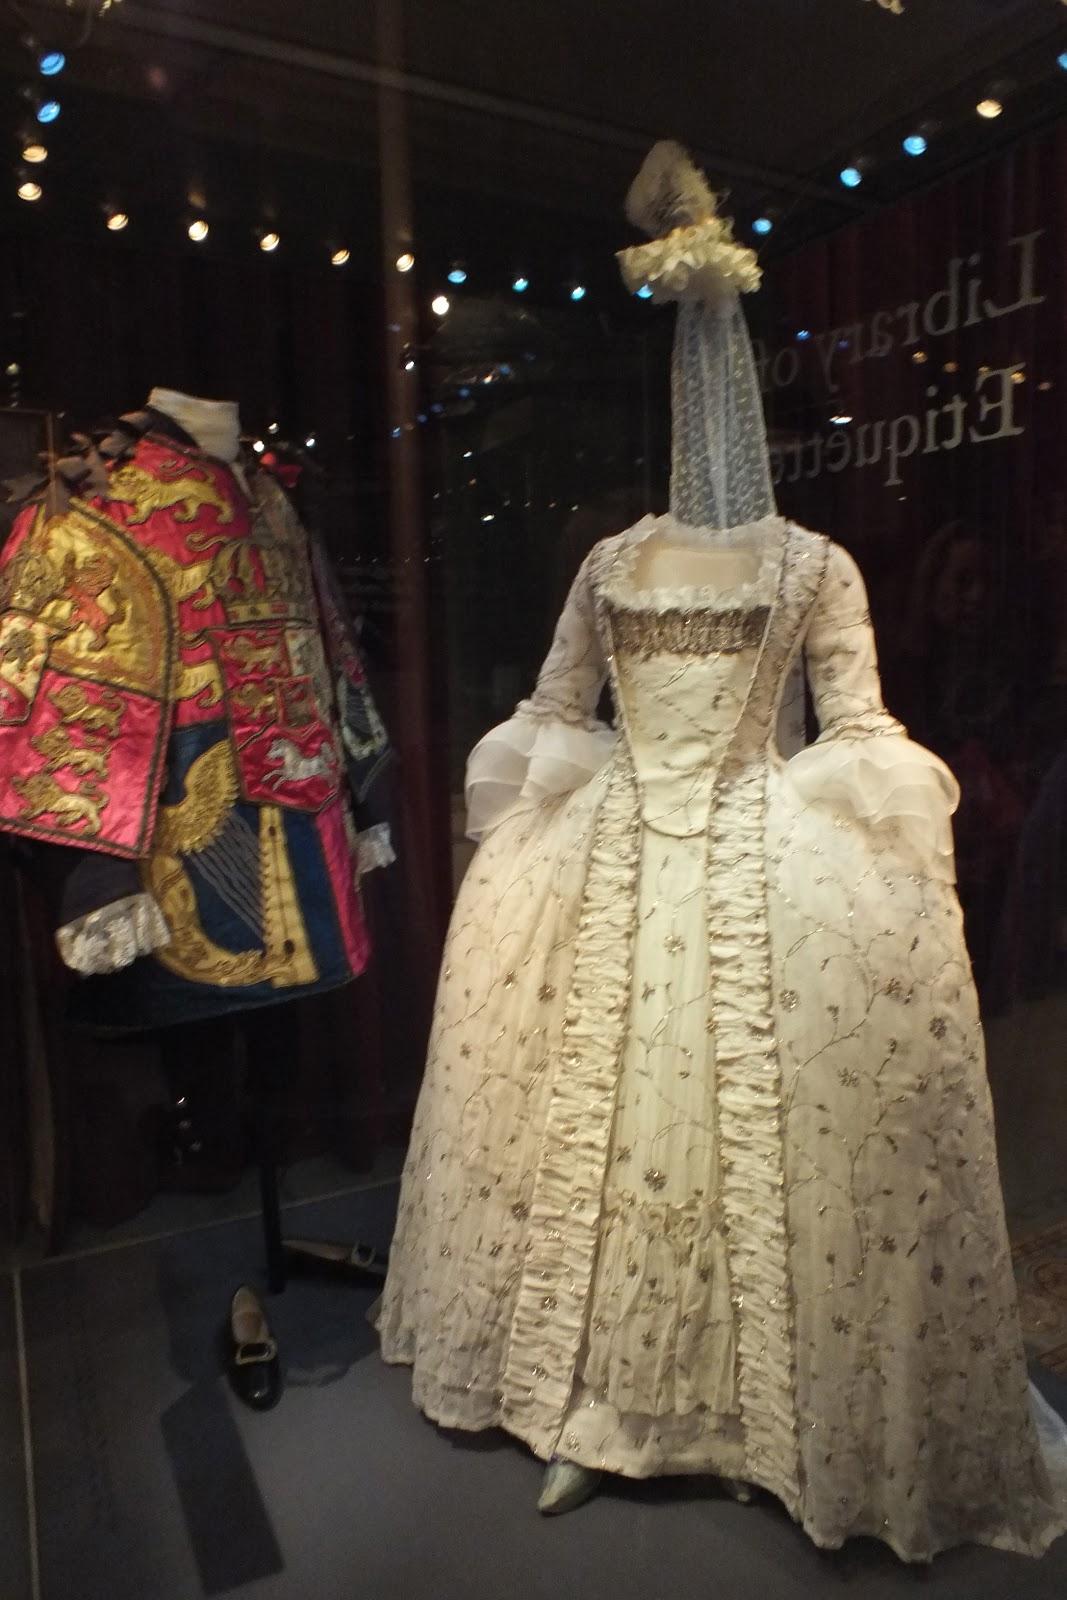 Aimee S Worldwide Adventures Kensington Palace Finally